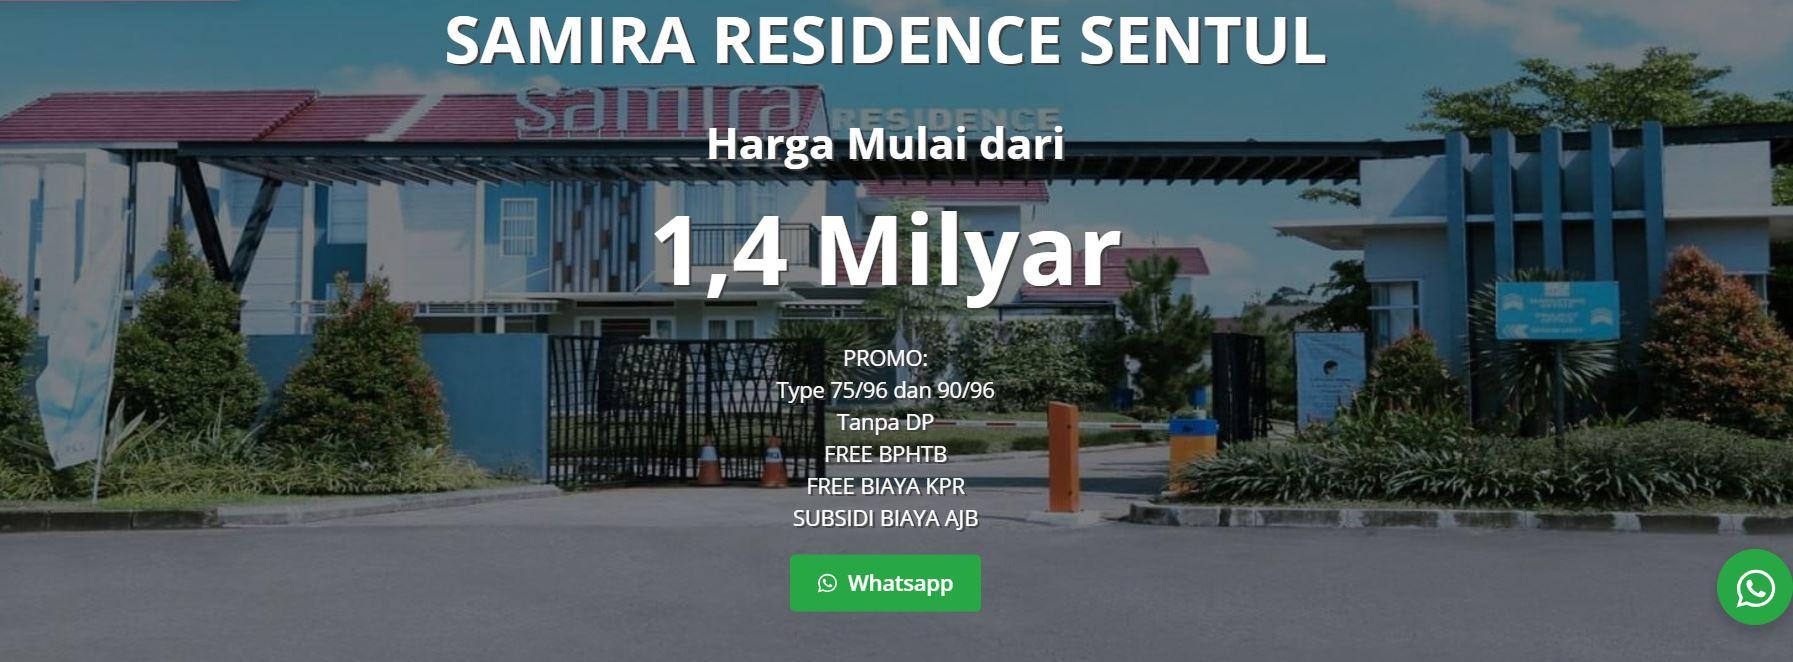 promo samira residence